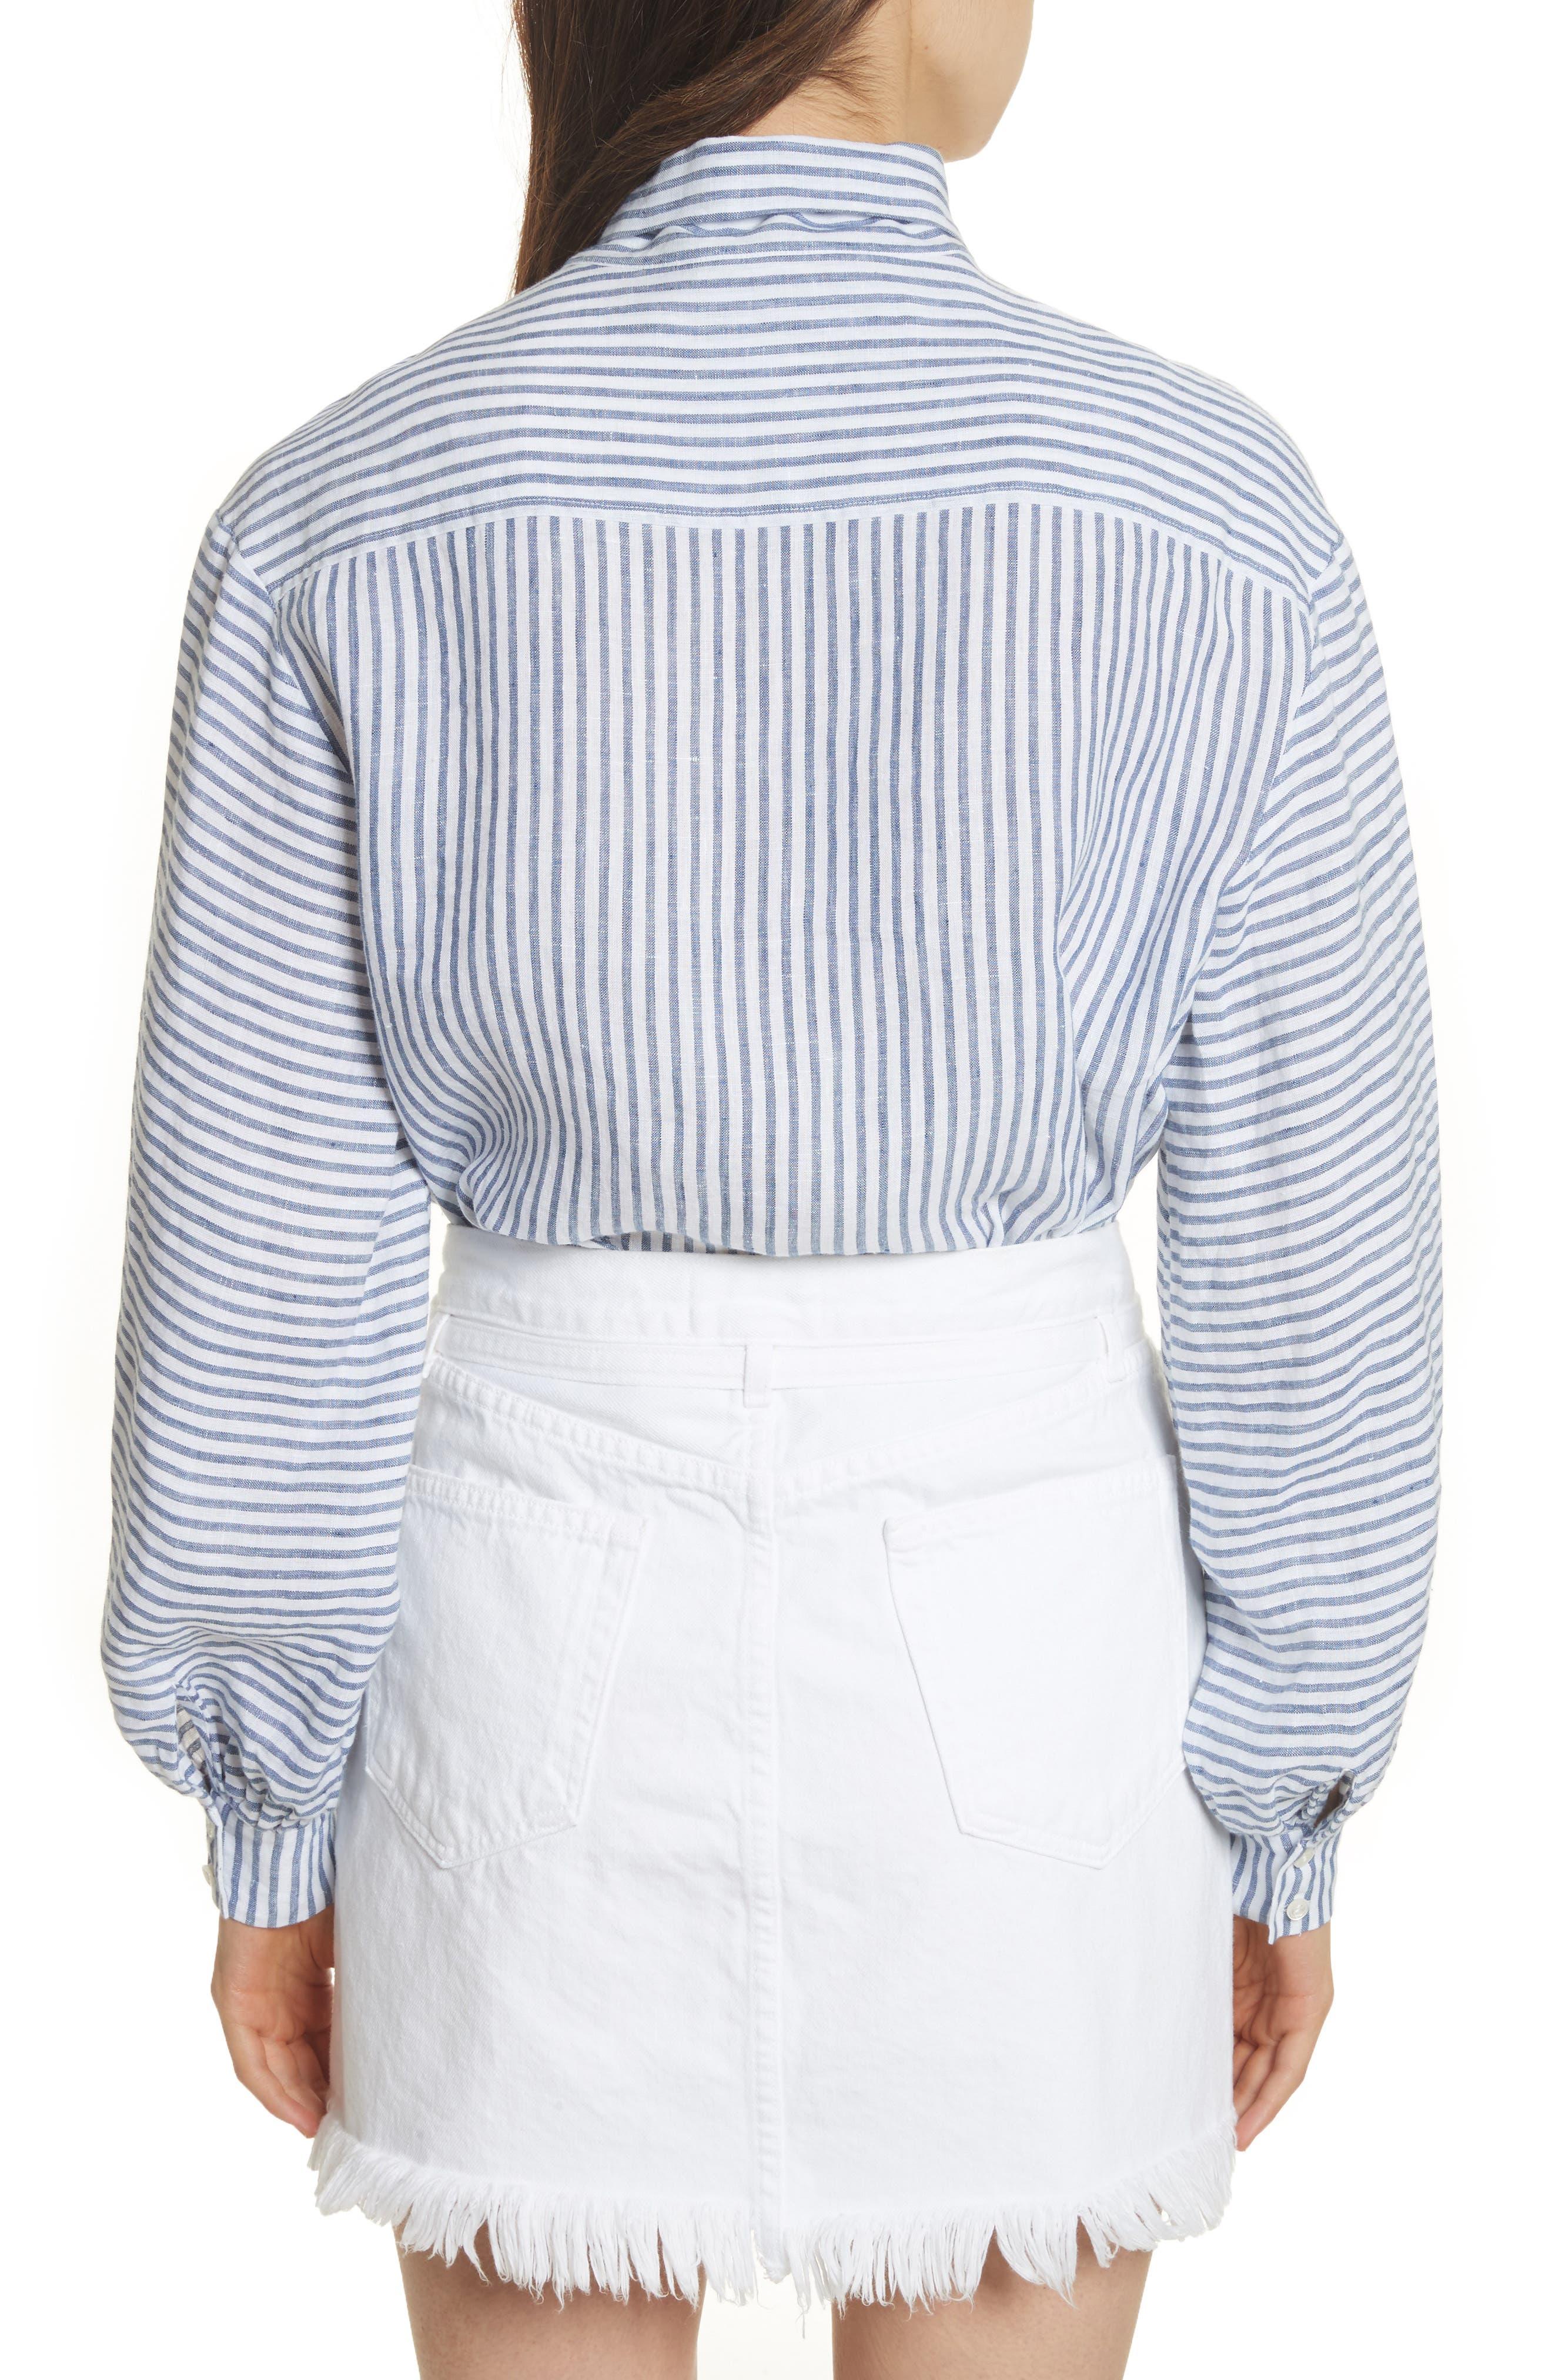 Stripe Handkerchief Blouse,                             Alternate thumbnail 3, color,                             Medium Blue Multi